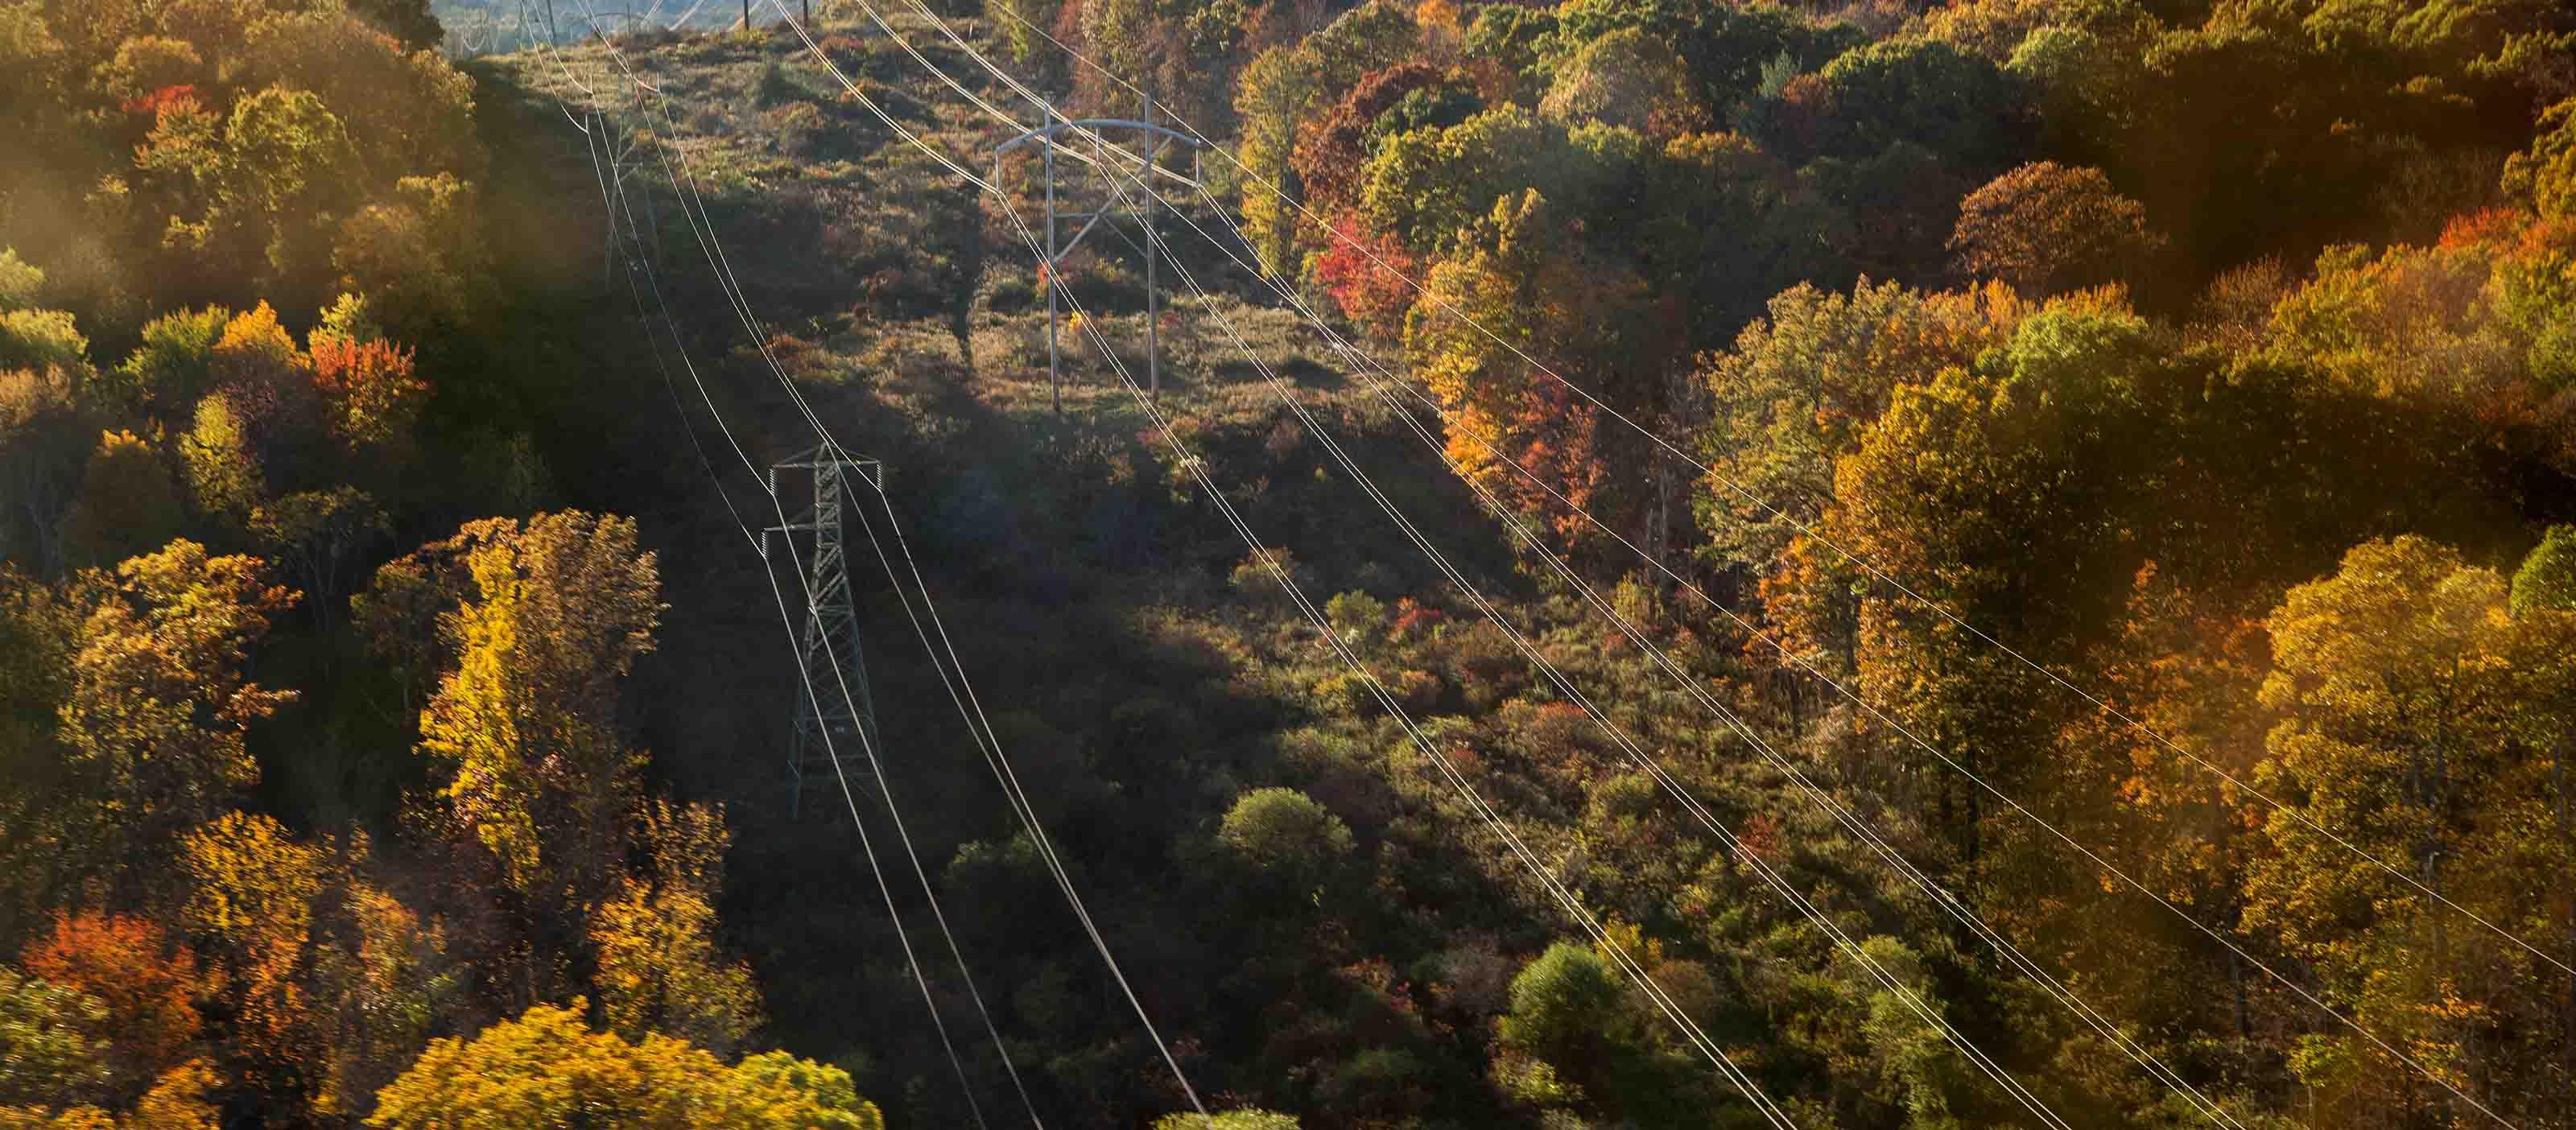 Visual Intelligence for vegetation management for utilities | GE Digital